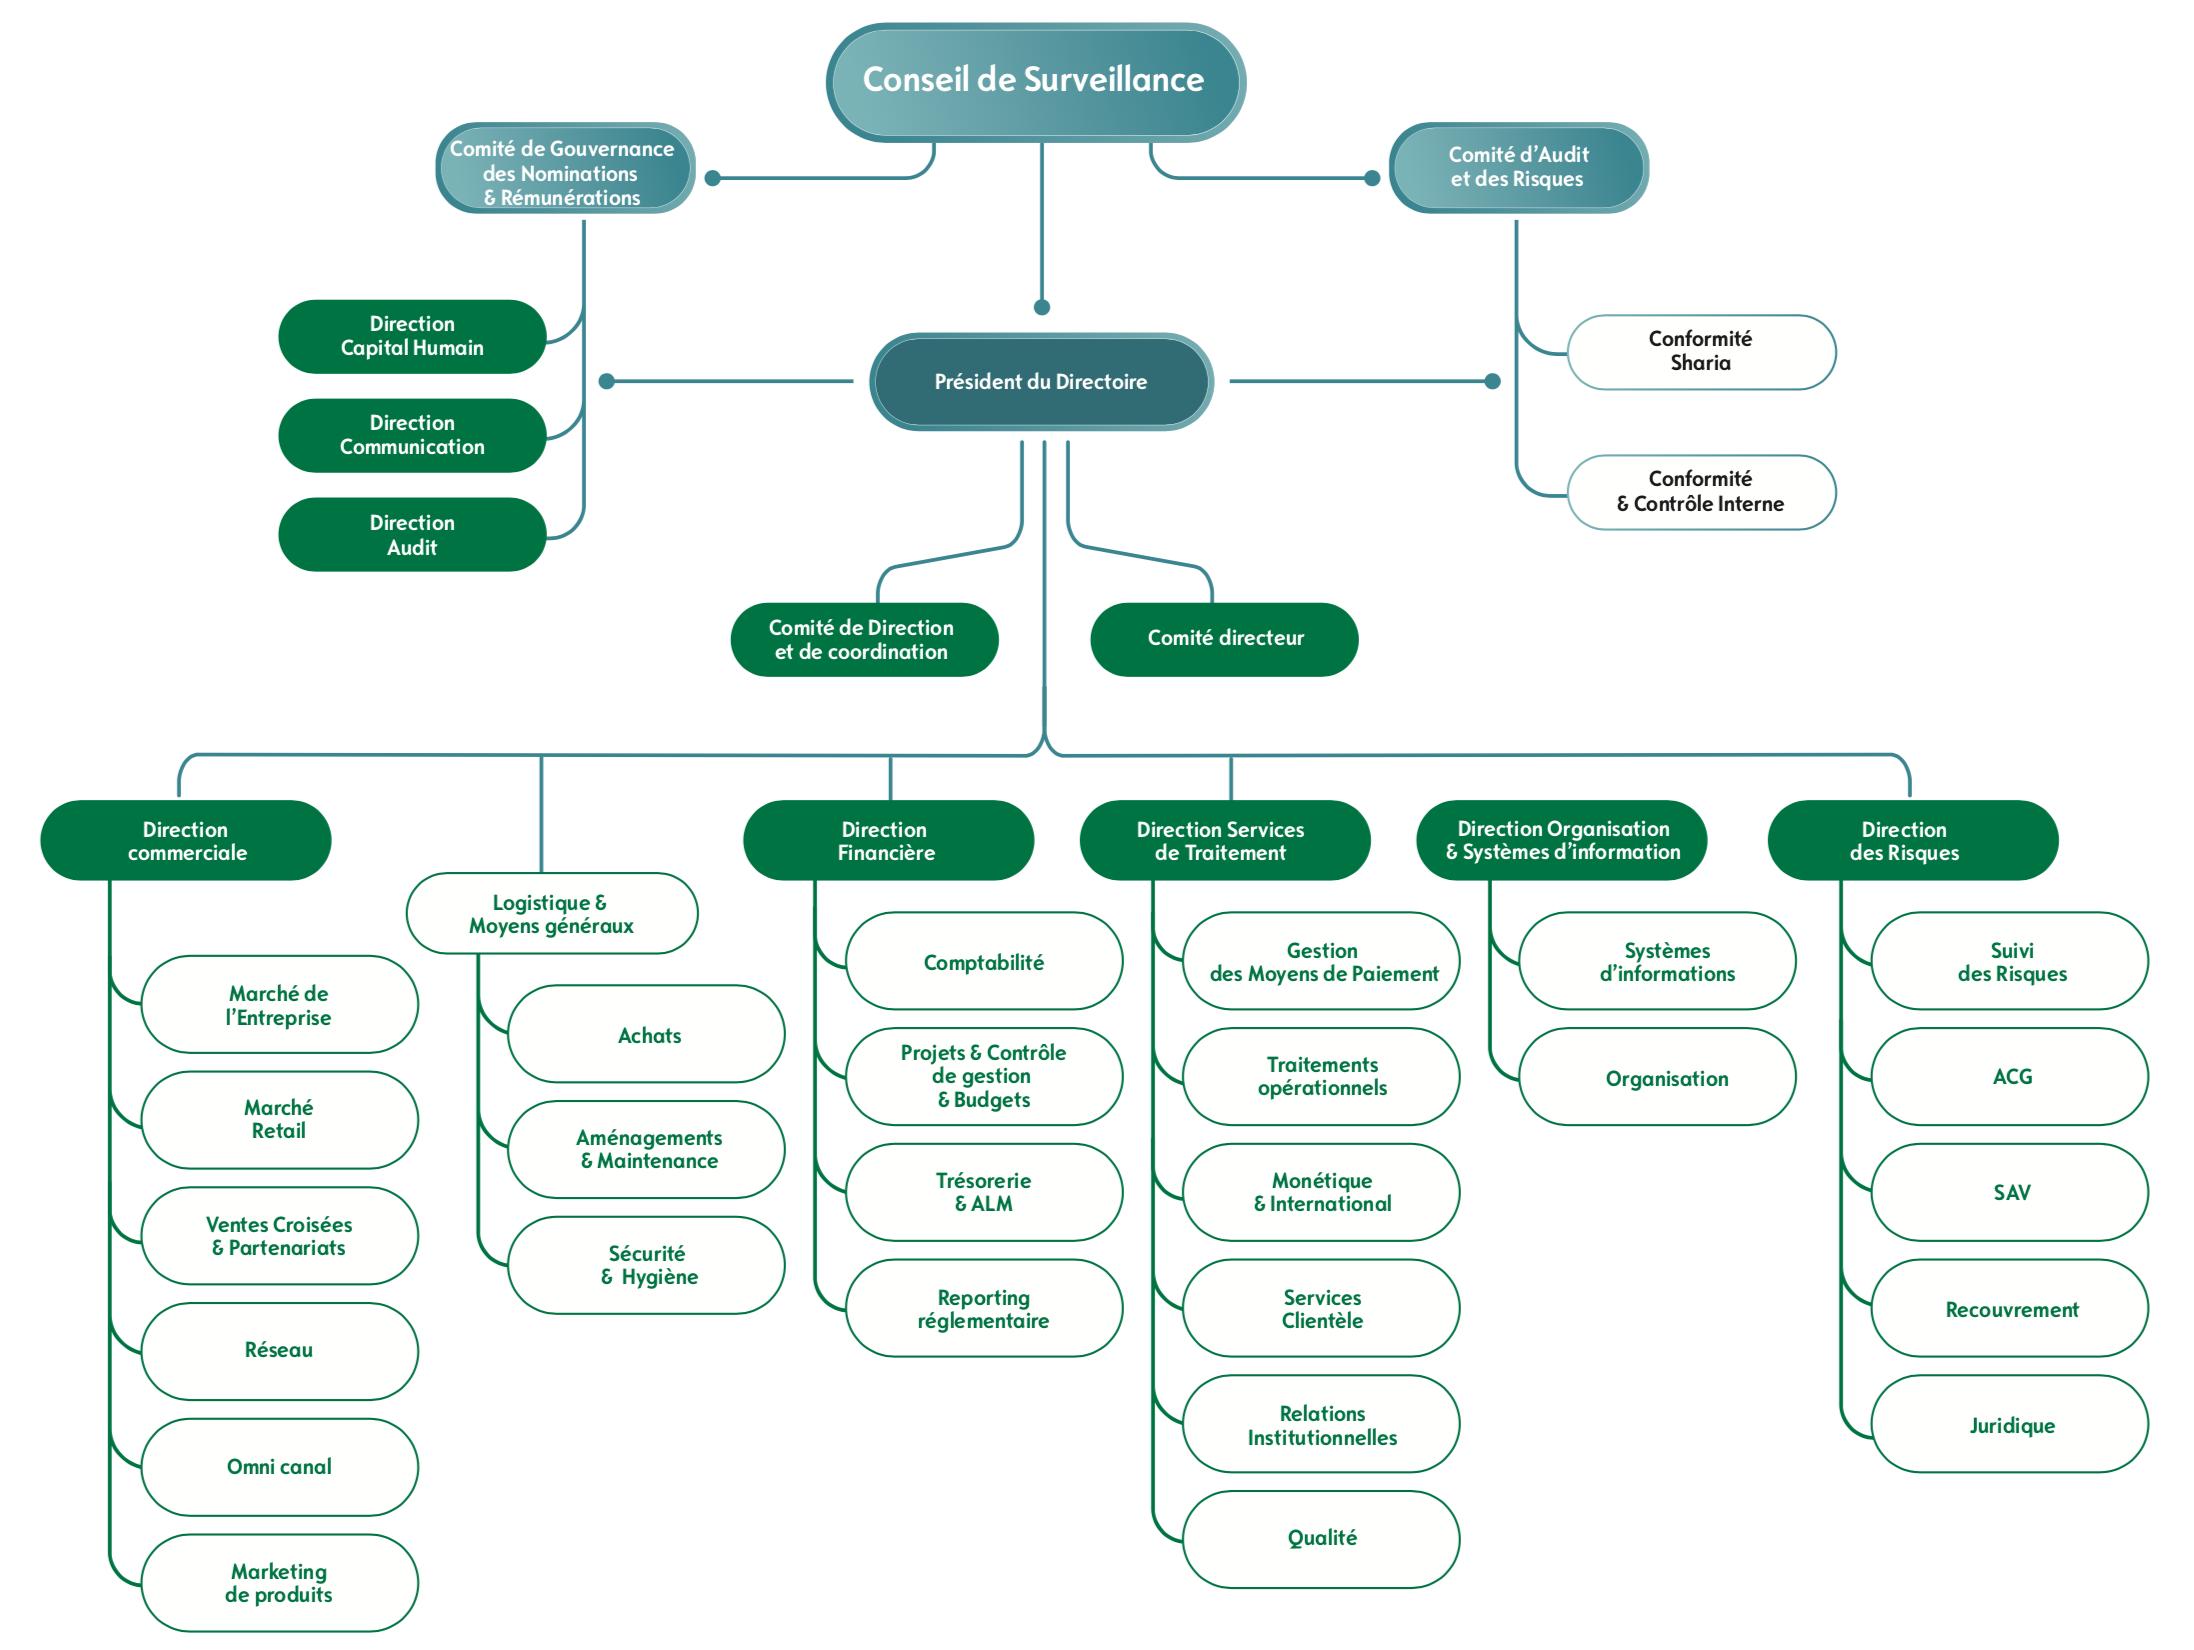 Bank Assafa Organigramme 2020